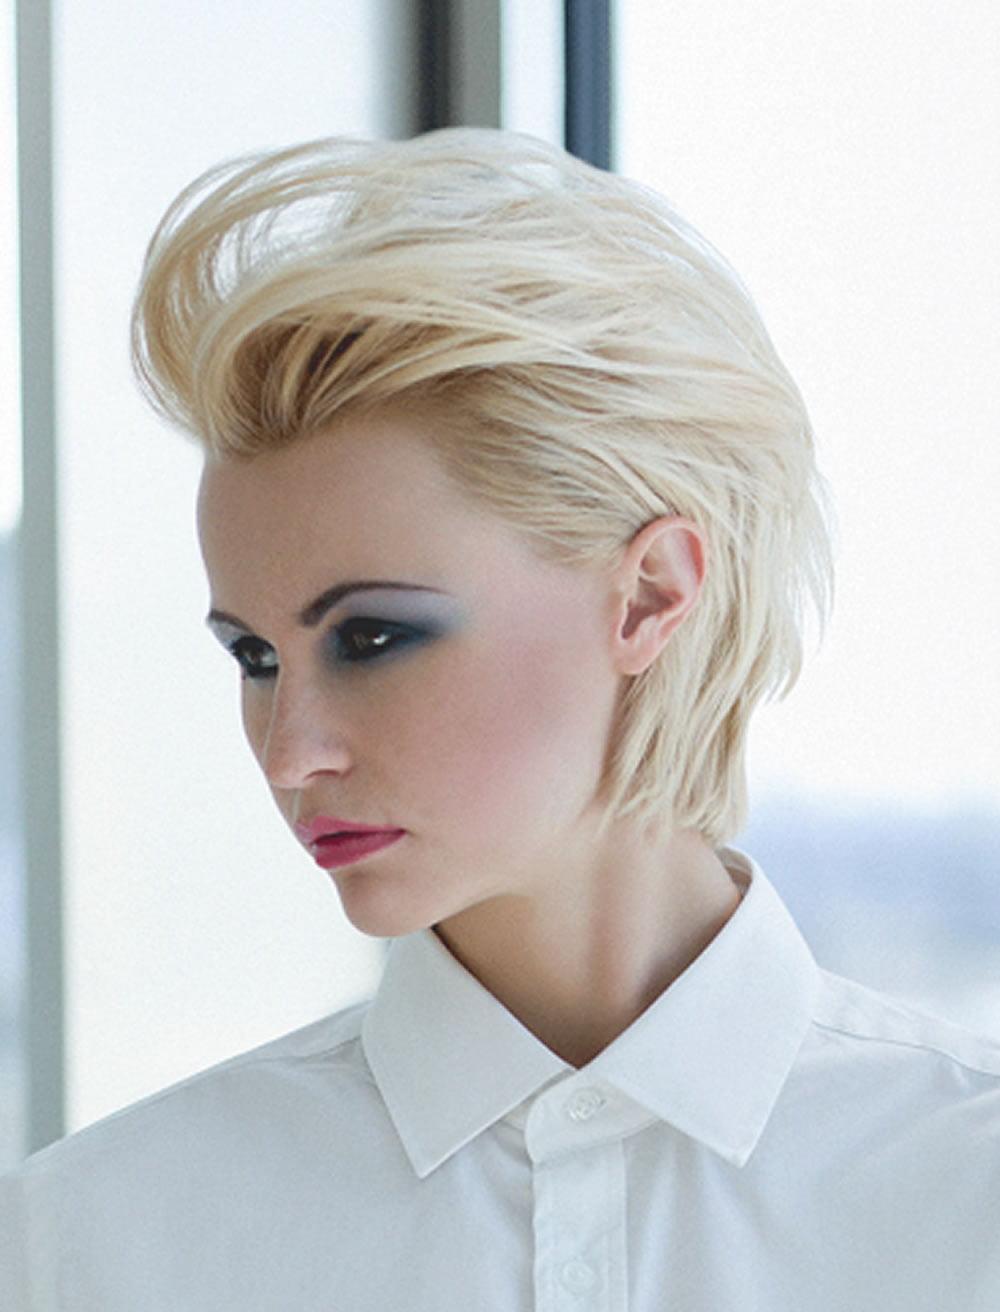 Easy Hairstyles for Short Hair 20182019  Pixie Hair Cuts